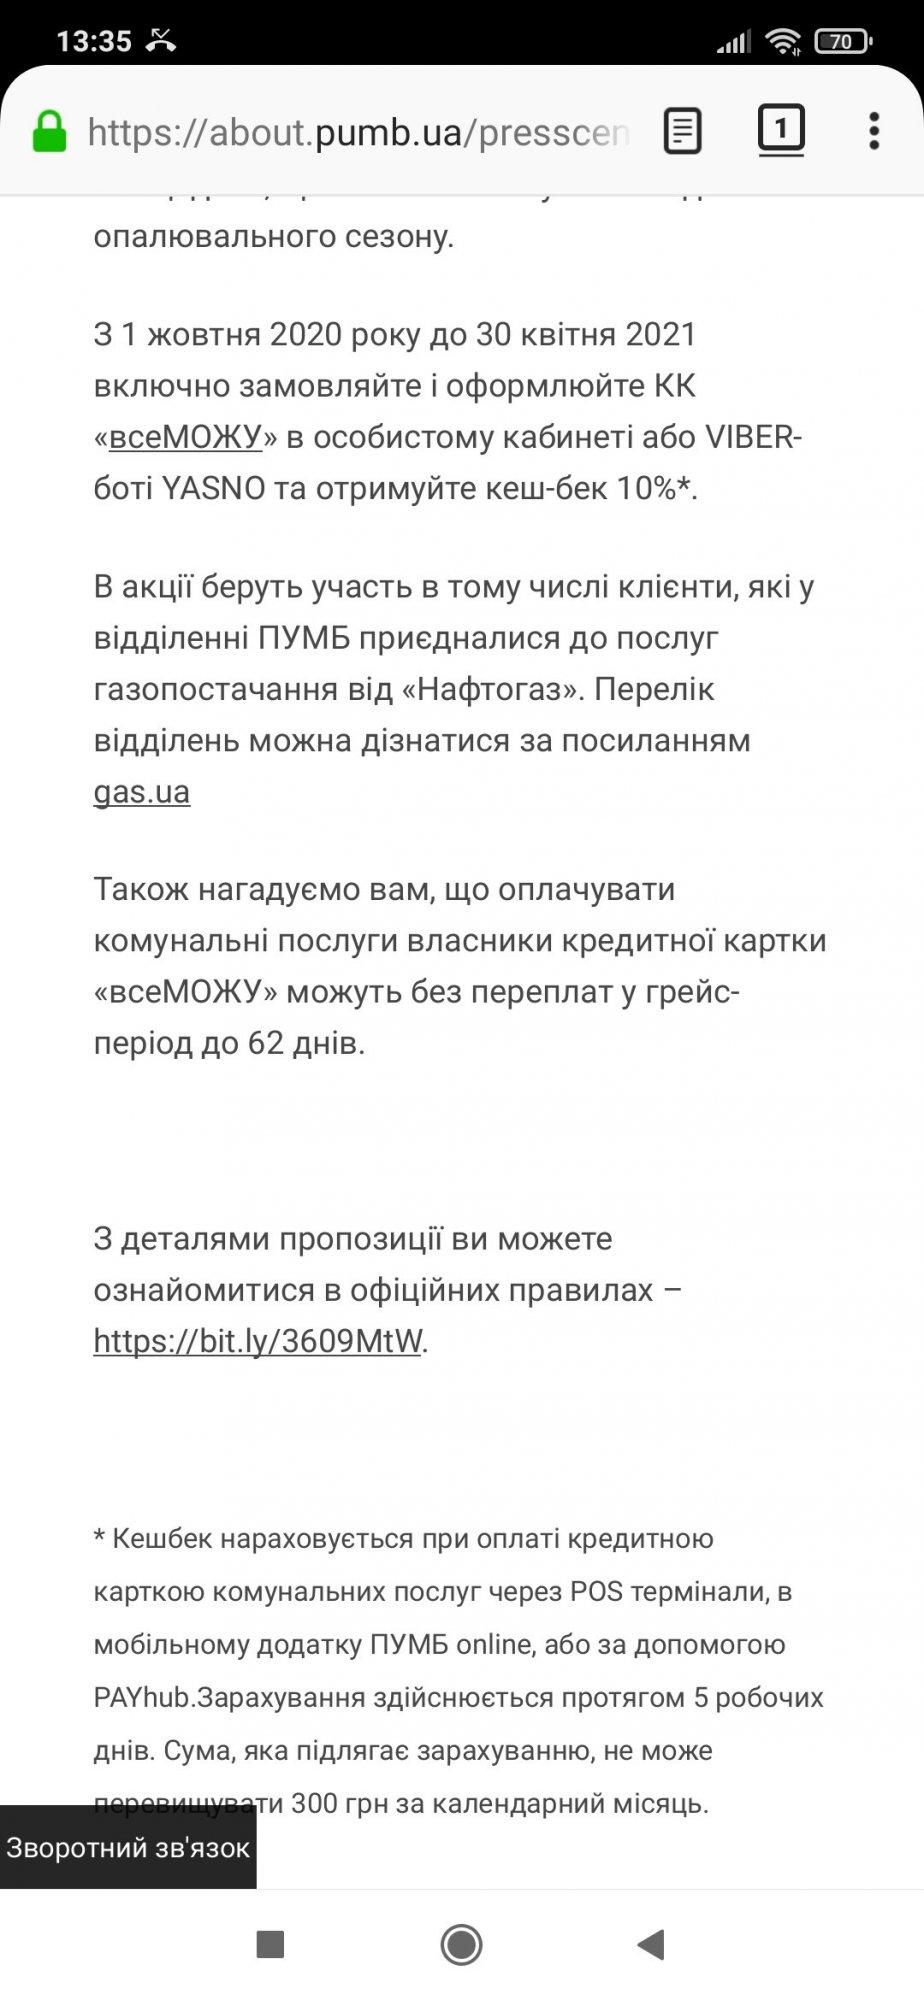 Screenshot_2021-02-03-13-35-26-406_org.mozilla.fennec_fdroid.jpg